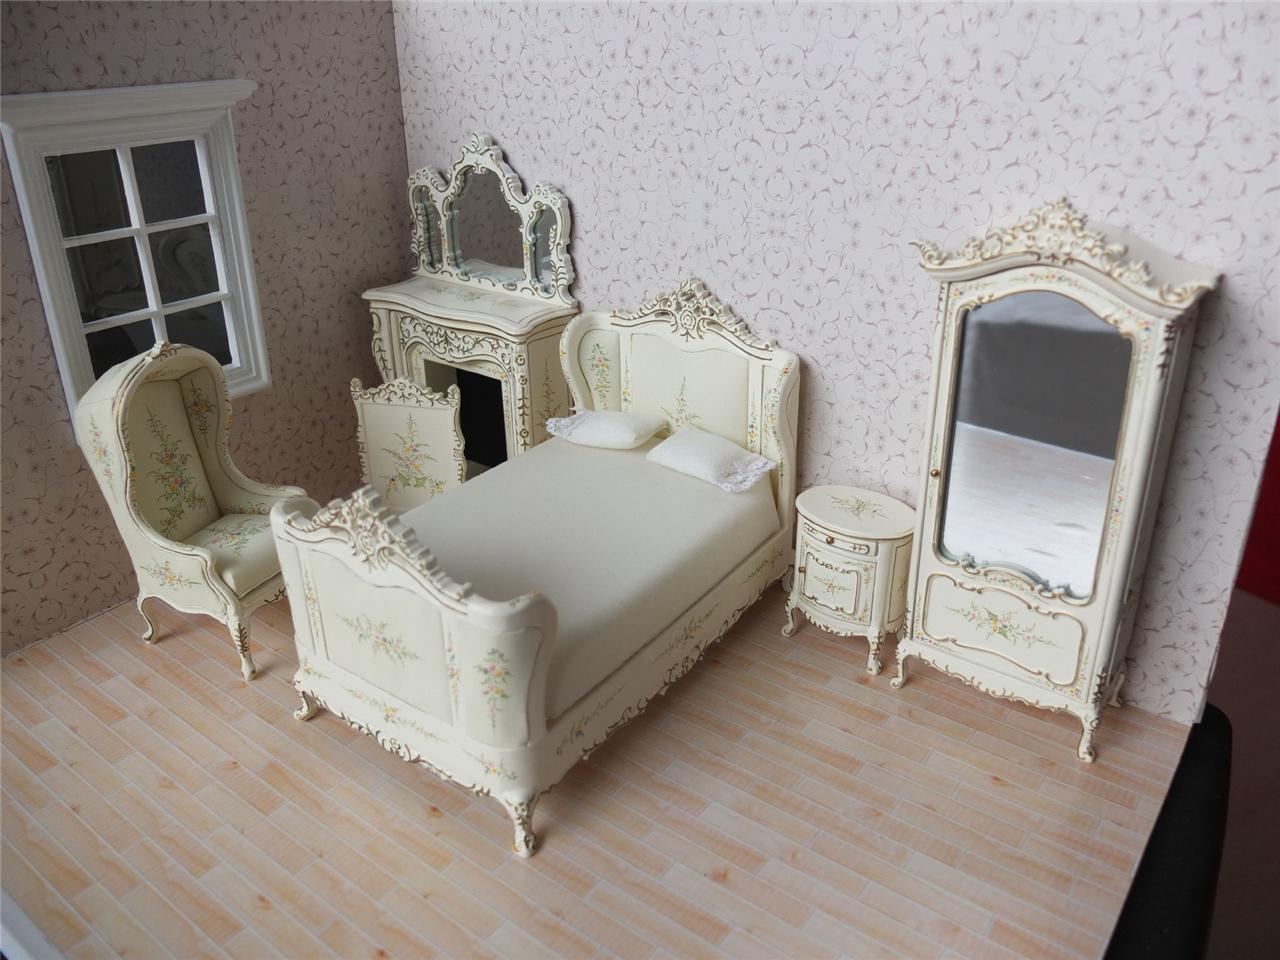 Bespaq Dollhouse Miniature French Bedroom Furniture Set